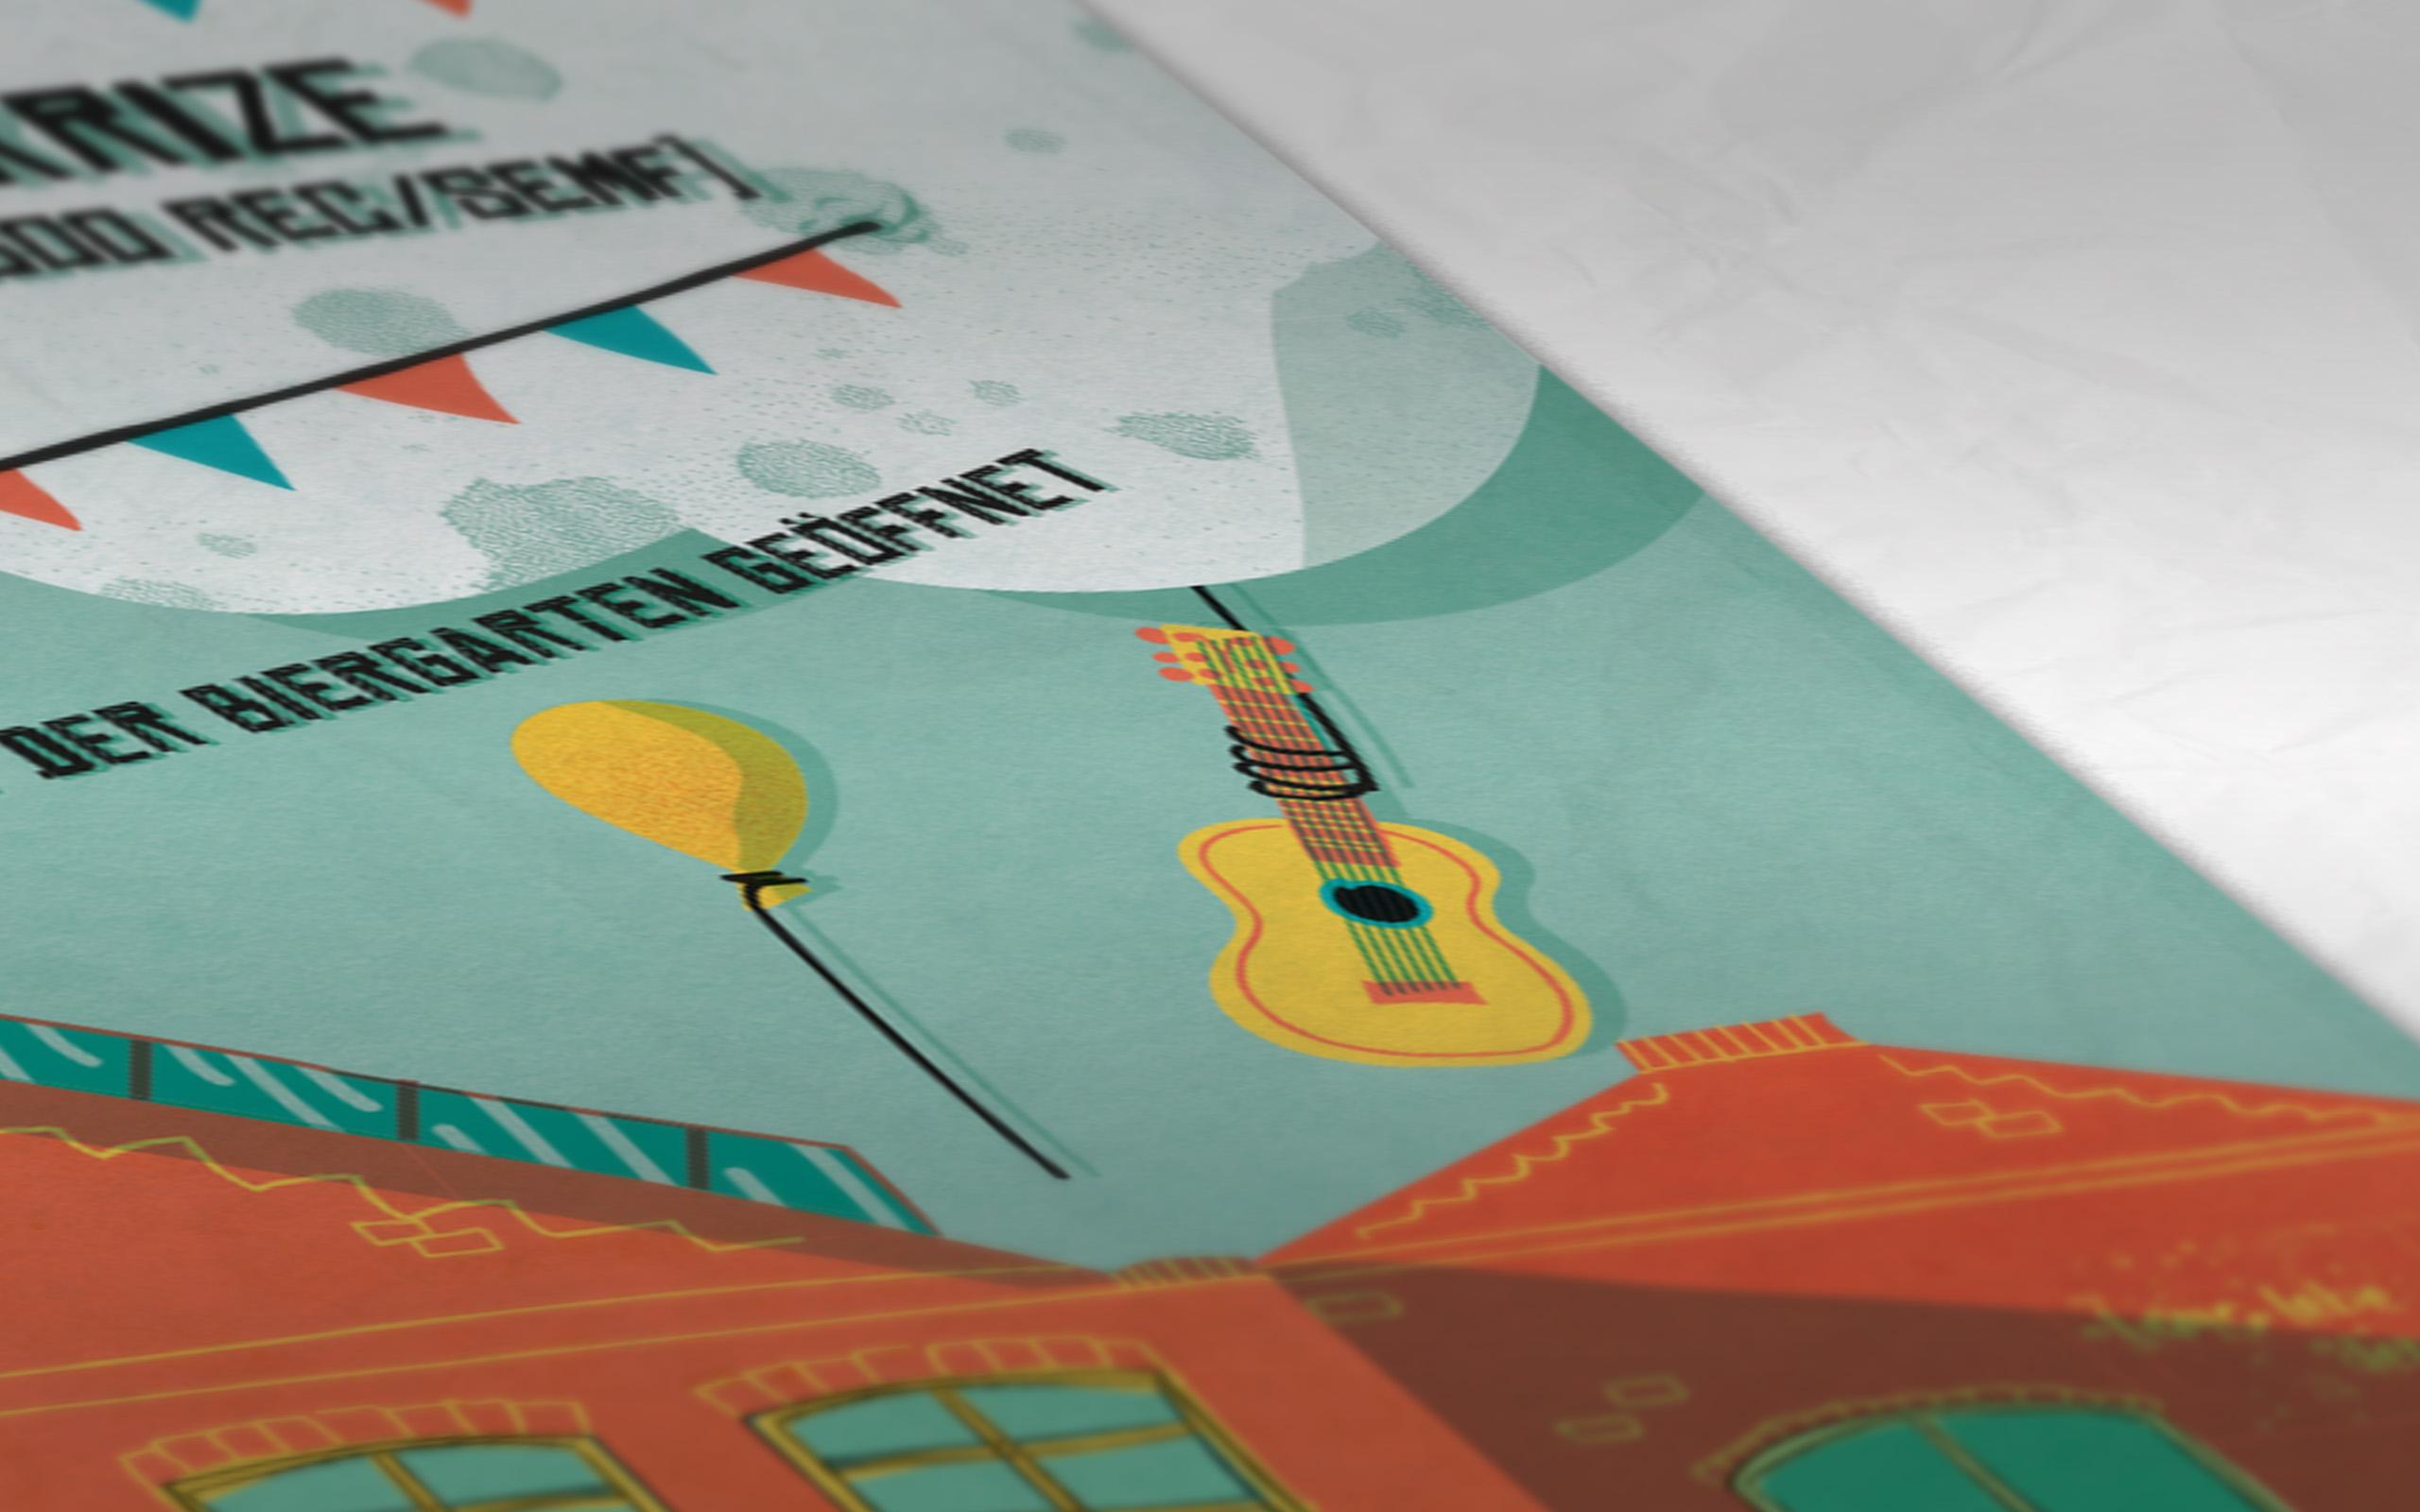 Wagenhallen Sommerfest Plakat Detail